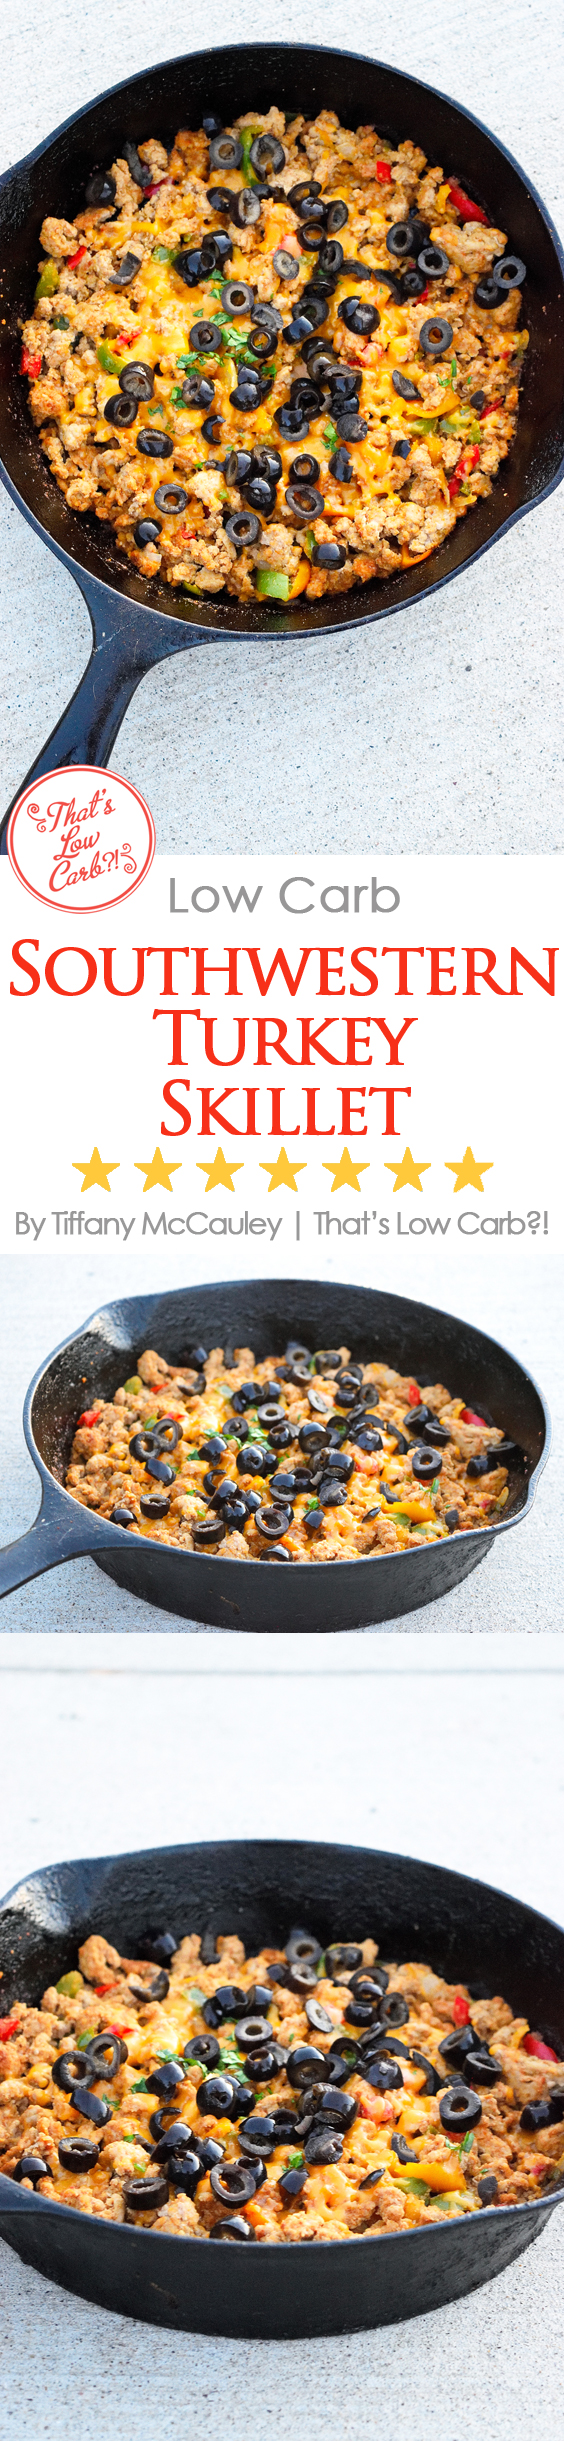 Low Carb Southwestern Turkey Skillet Recipe